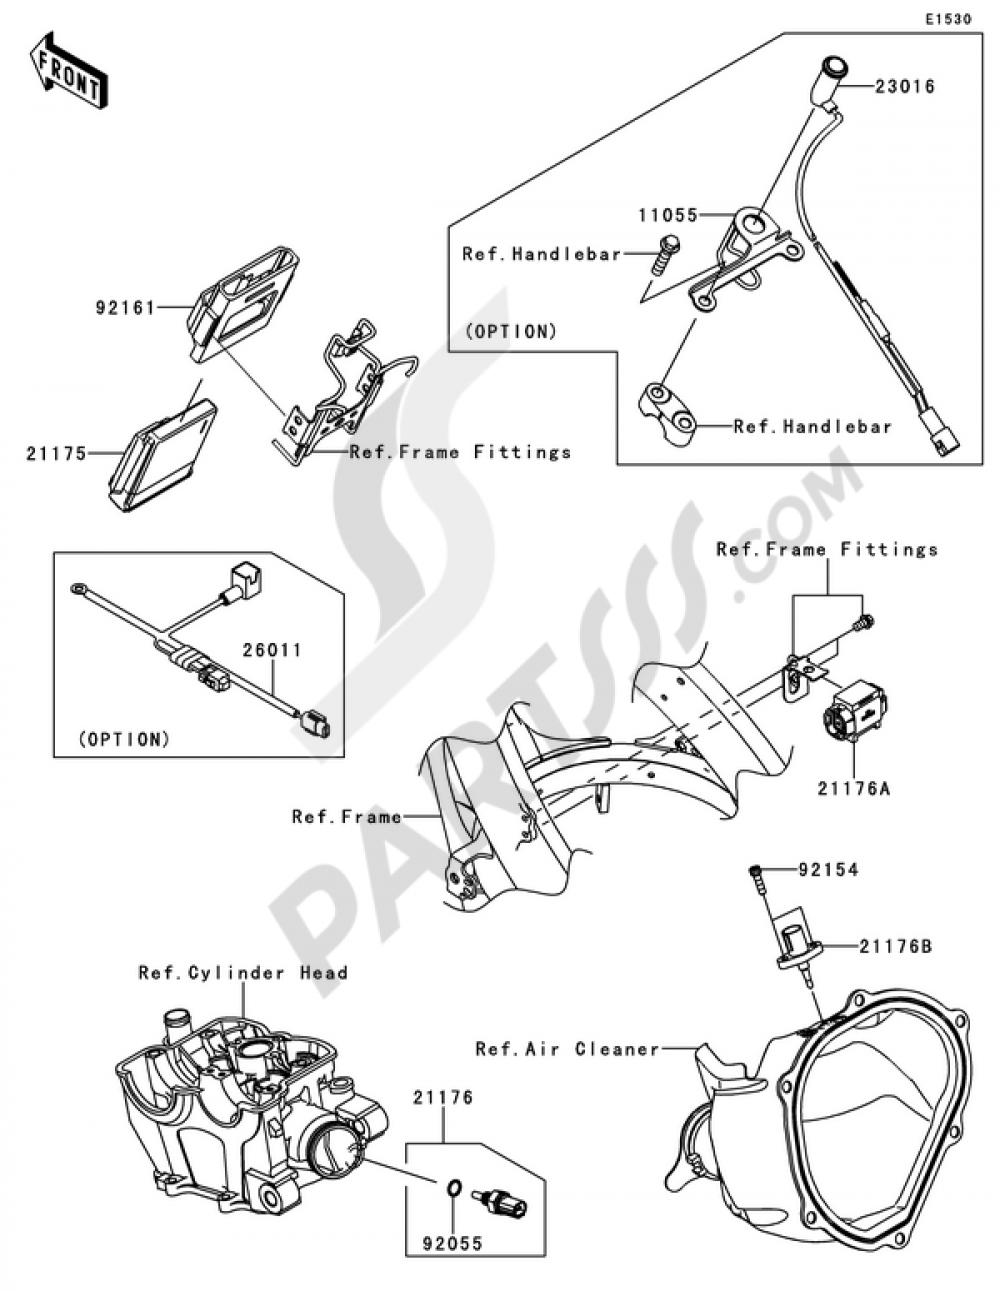 Fuel Injection Kawasaki Kx250f 2012 Wiring Diagram